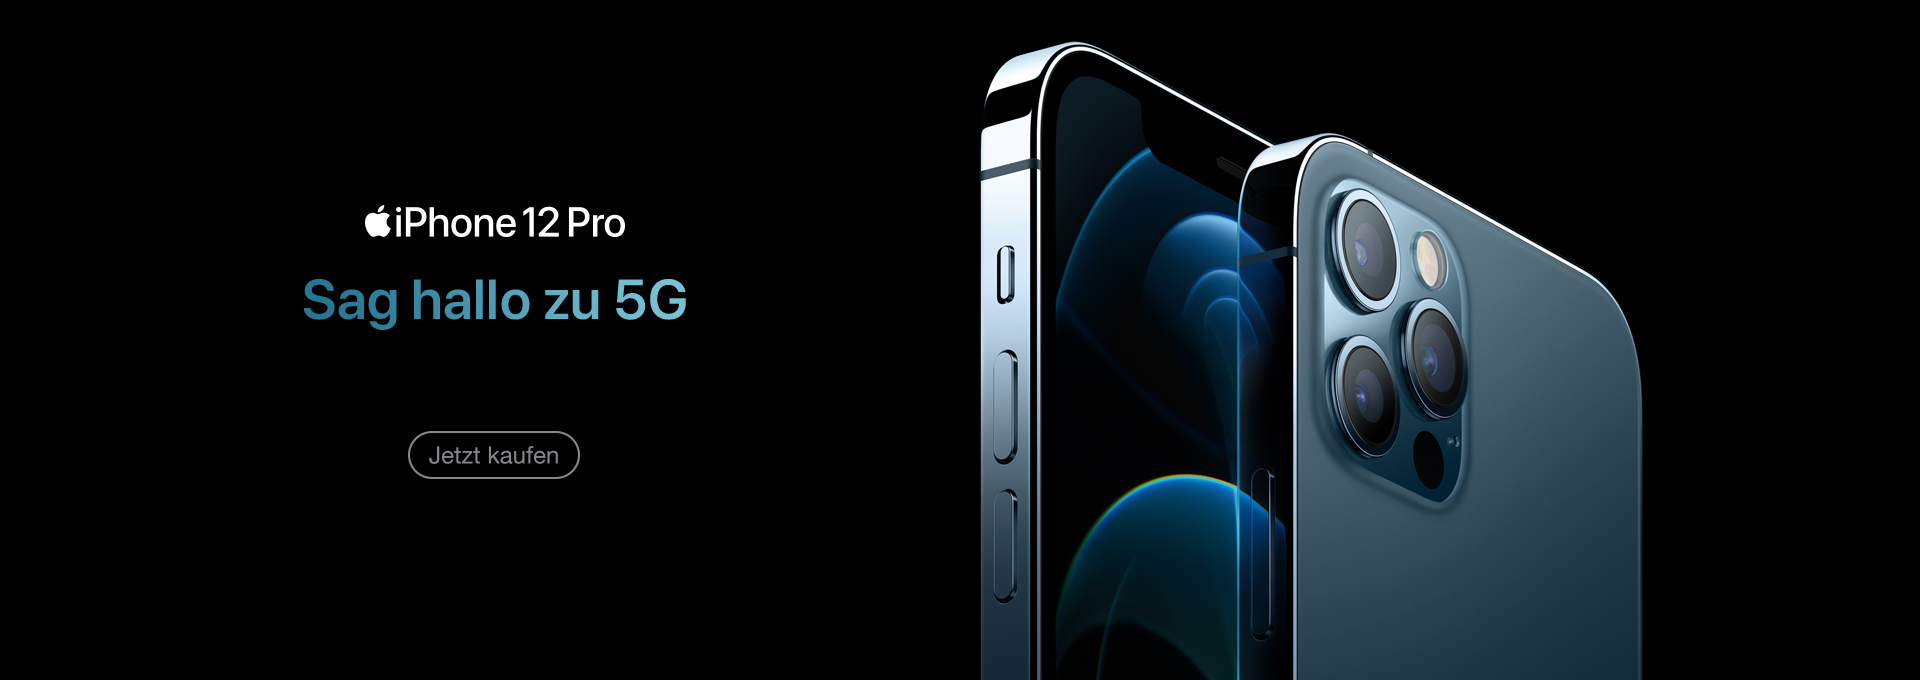 Jetzt Apple iPhone 12 Pro kaufen